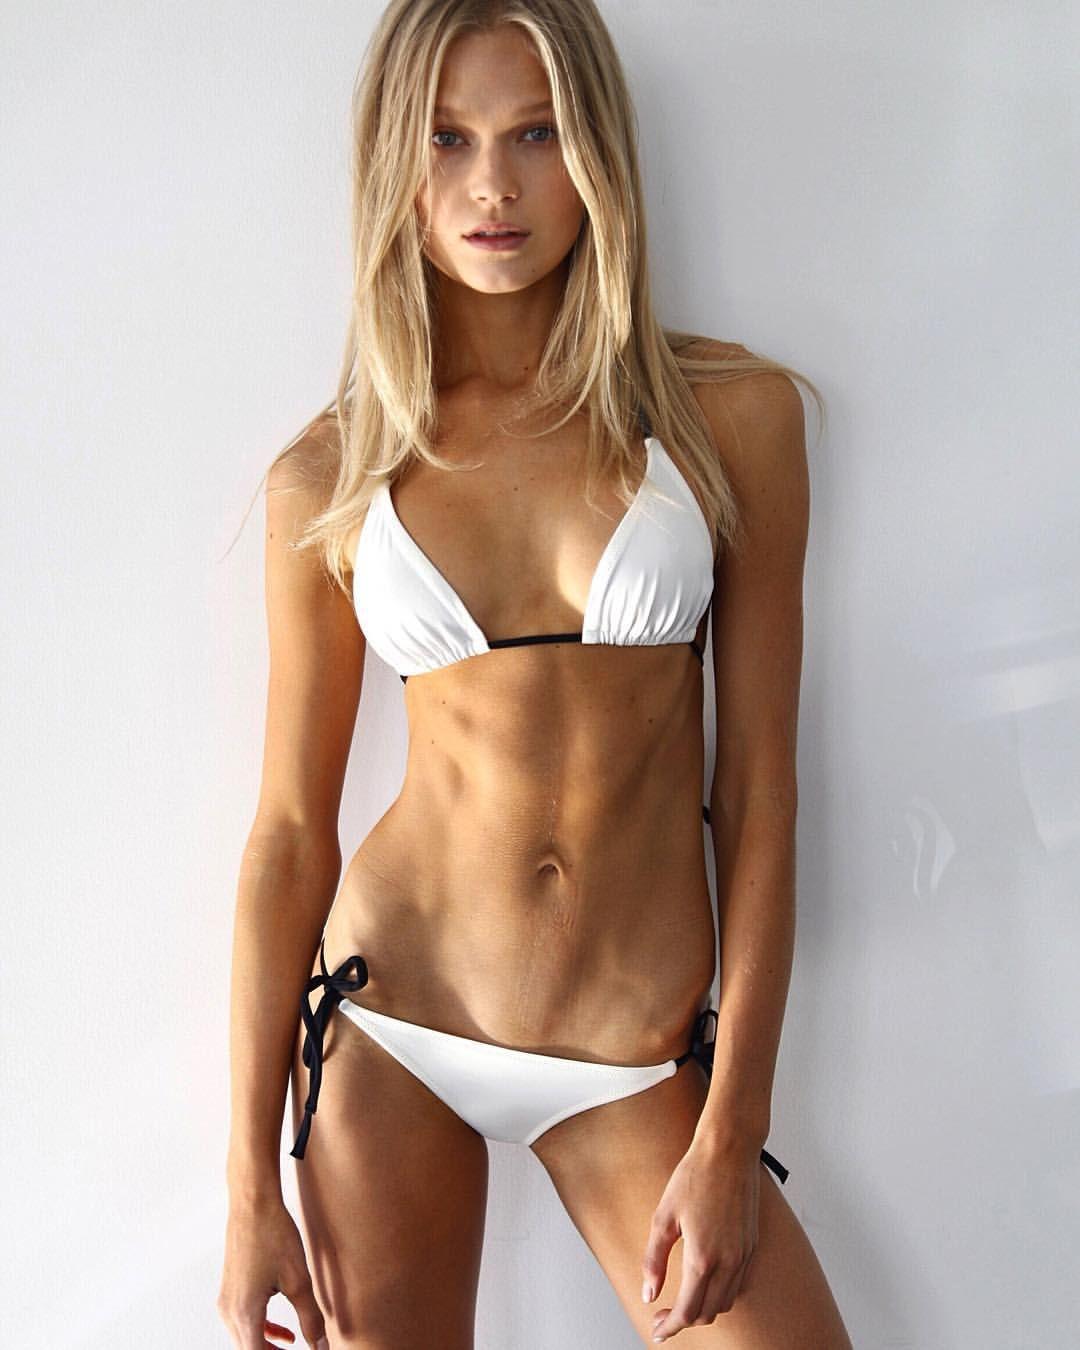 Bikini Vita Sidorkina-Morabito nudes (54 photos), Pussy, Fappening, Boobs, see through 2006